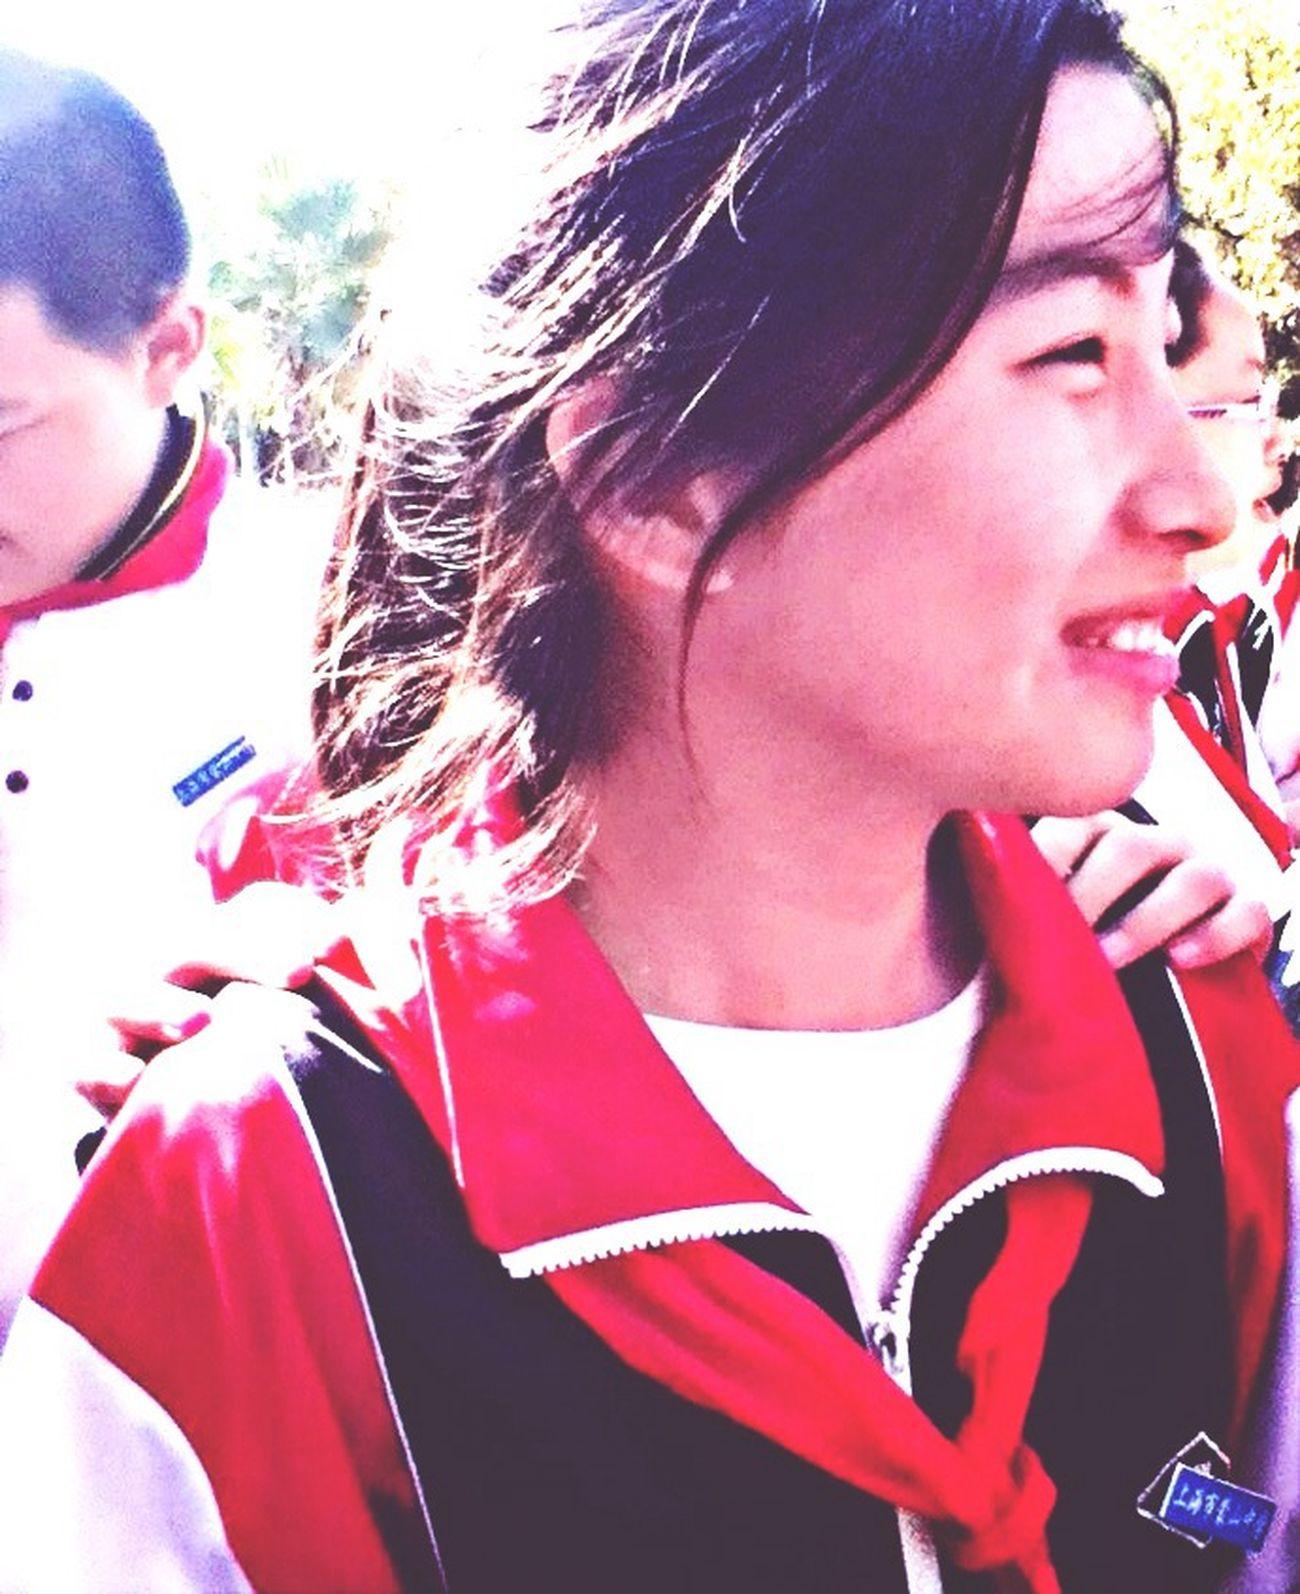 233333 First Eyeem Photo